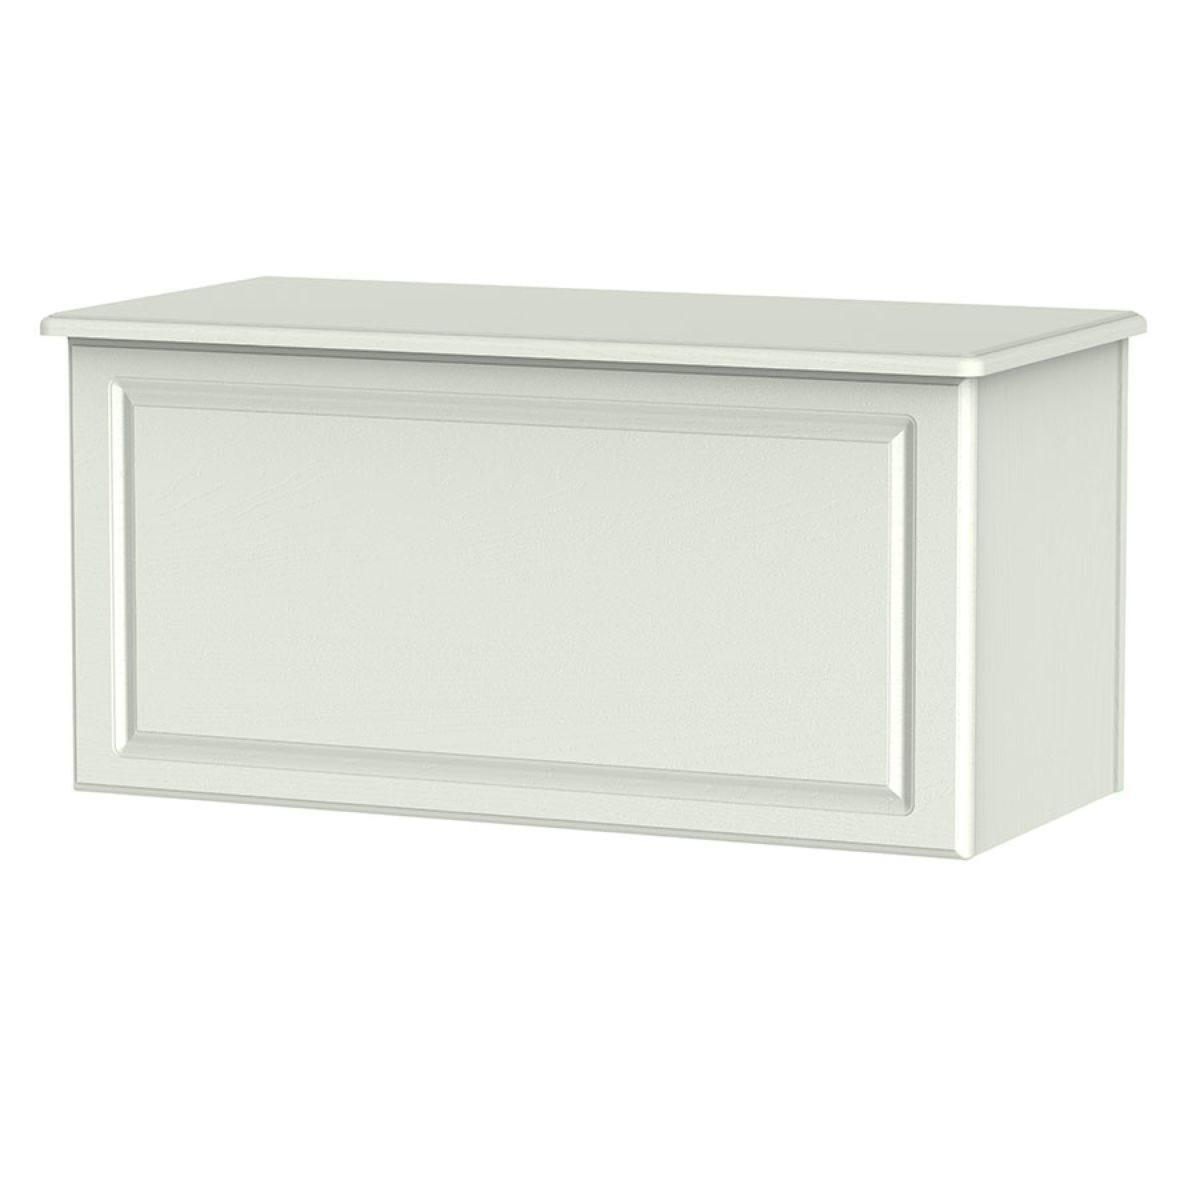 Montego Blanket Box - Ash Grey